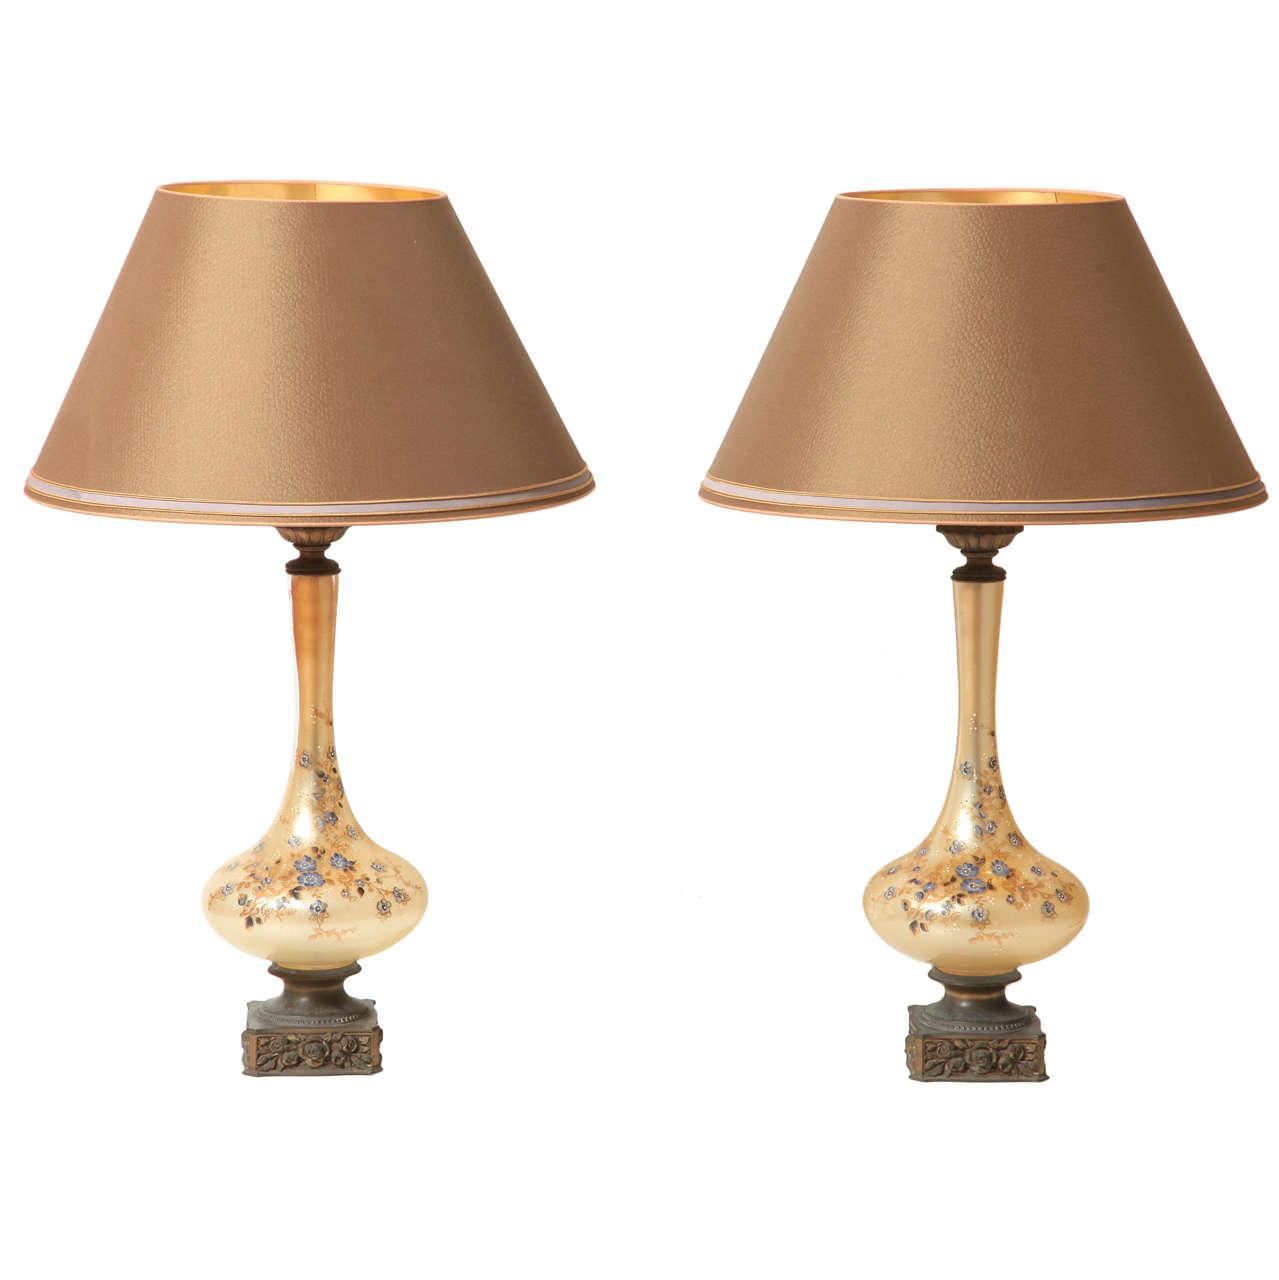 Pair Of 1930s Lamps At 1stdibs